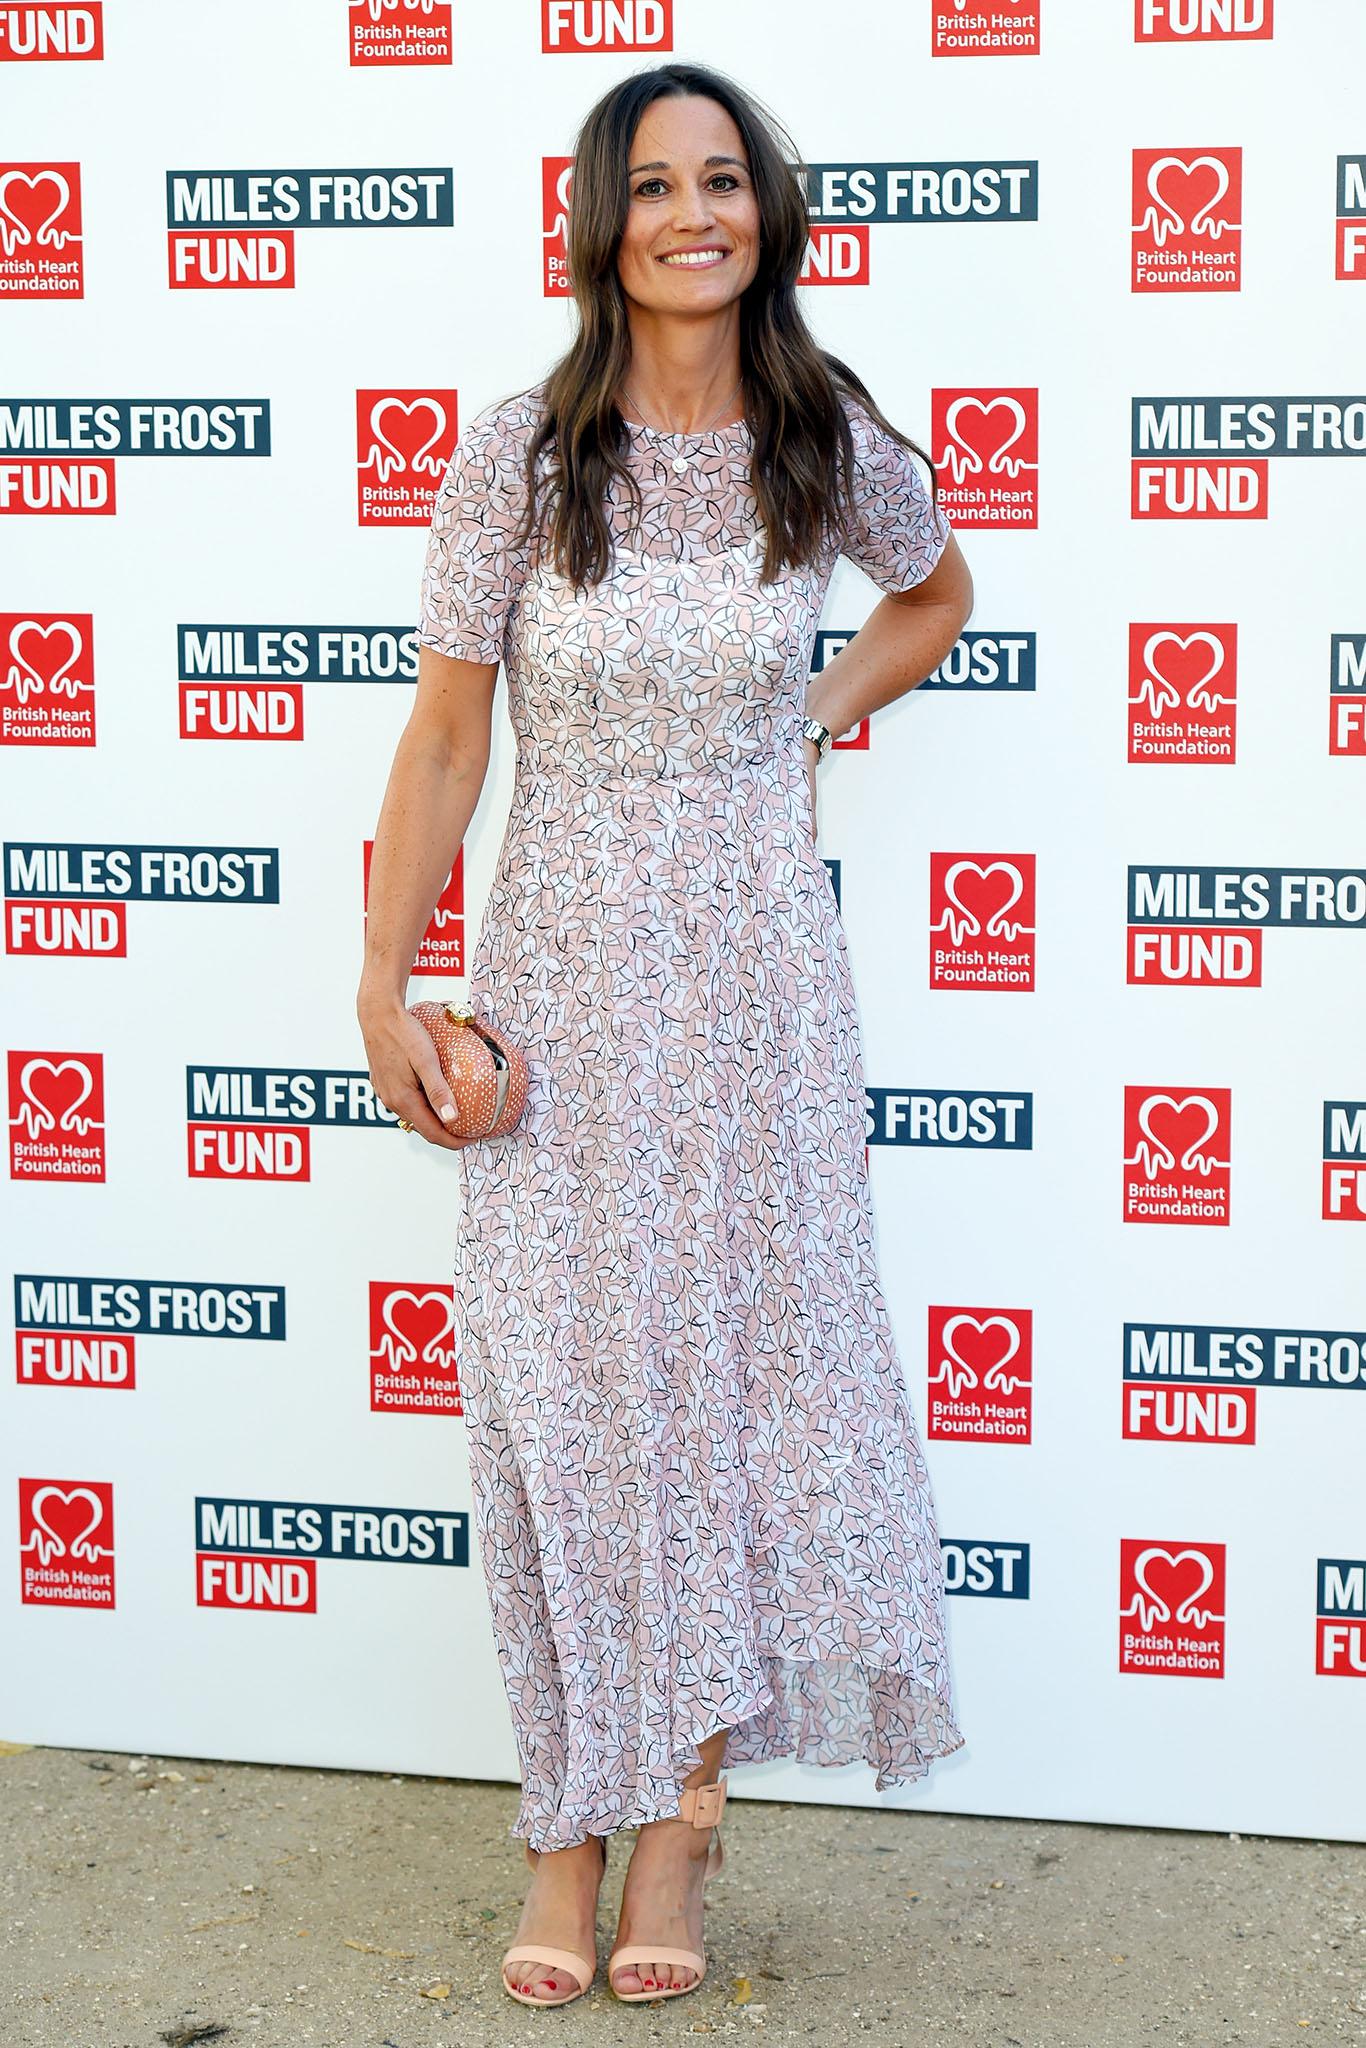 Pippa MiddletonFrost Summer Party, London, Britain - 18 Jul 2016WEARING L.K. BENNETT DRESS